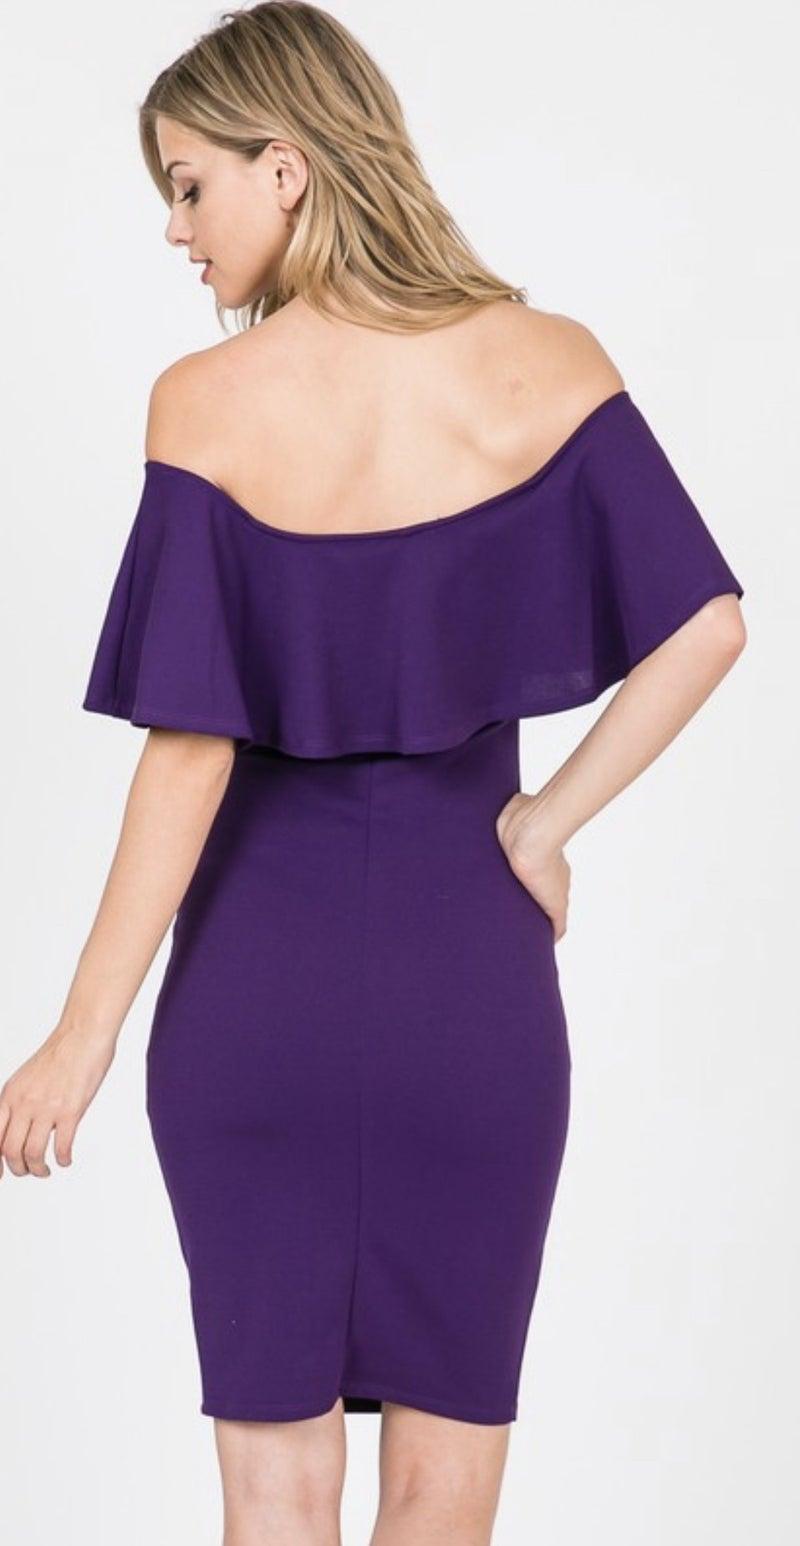 Ruffle v-neck dress